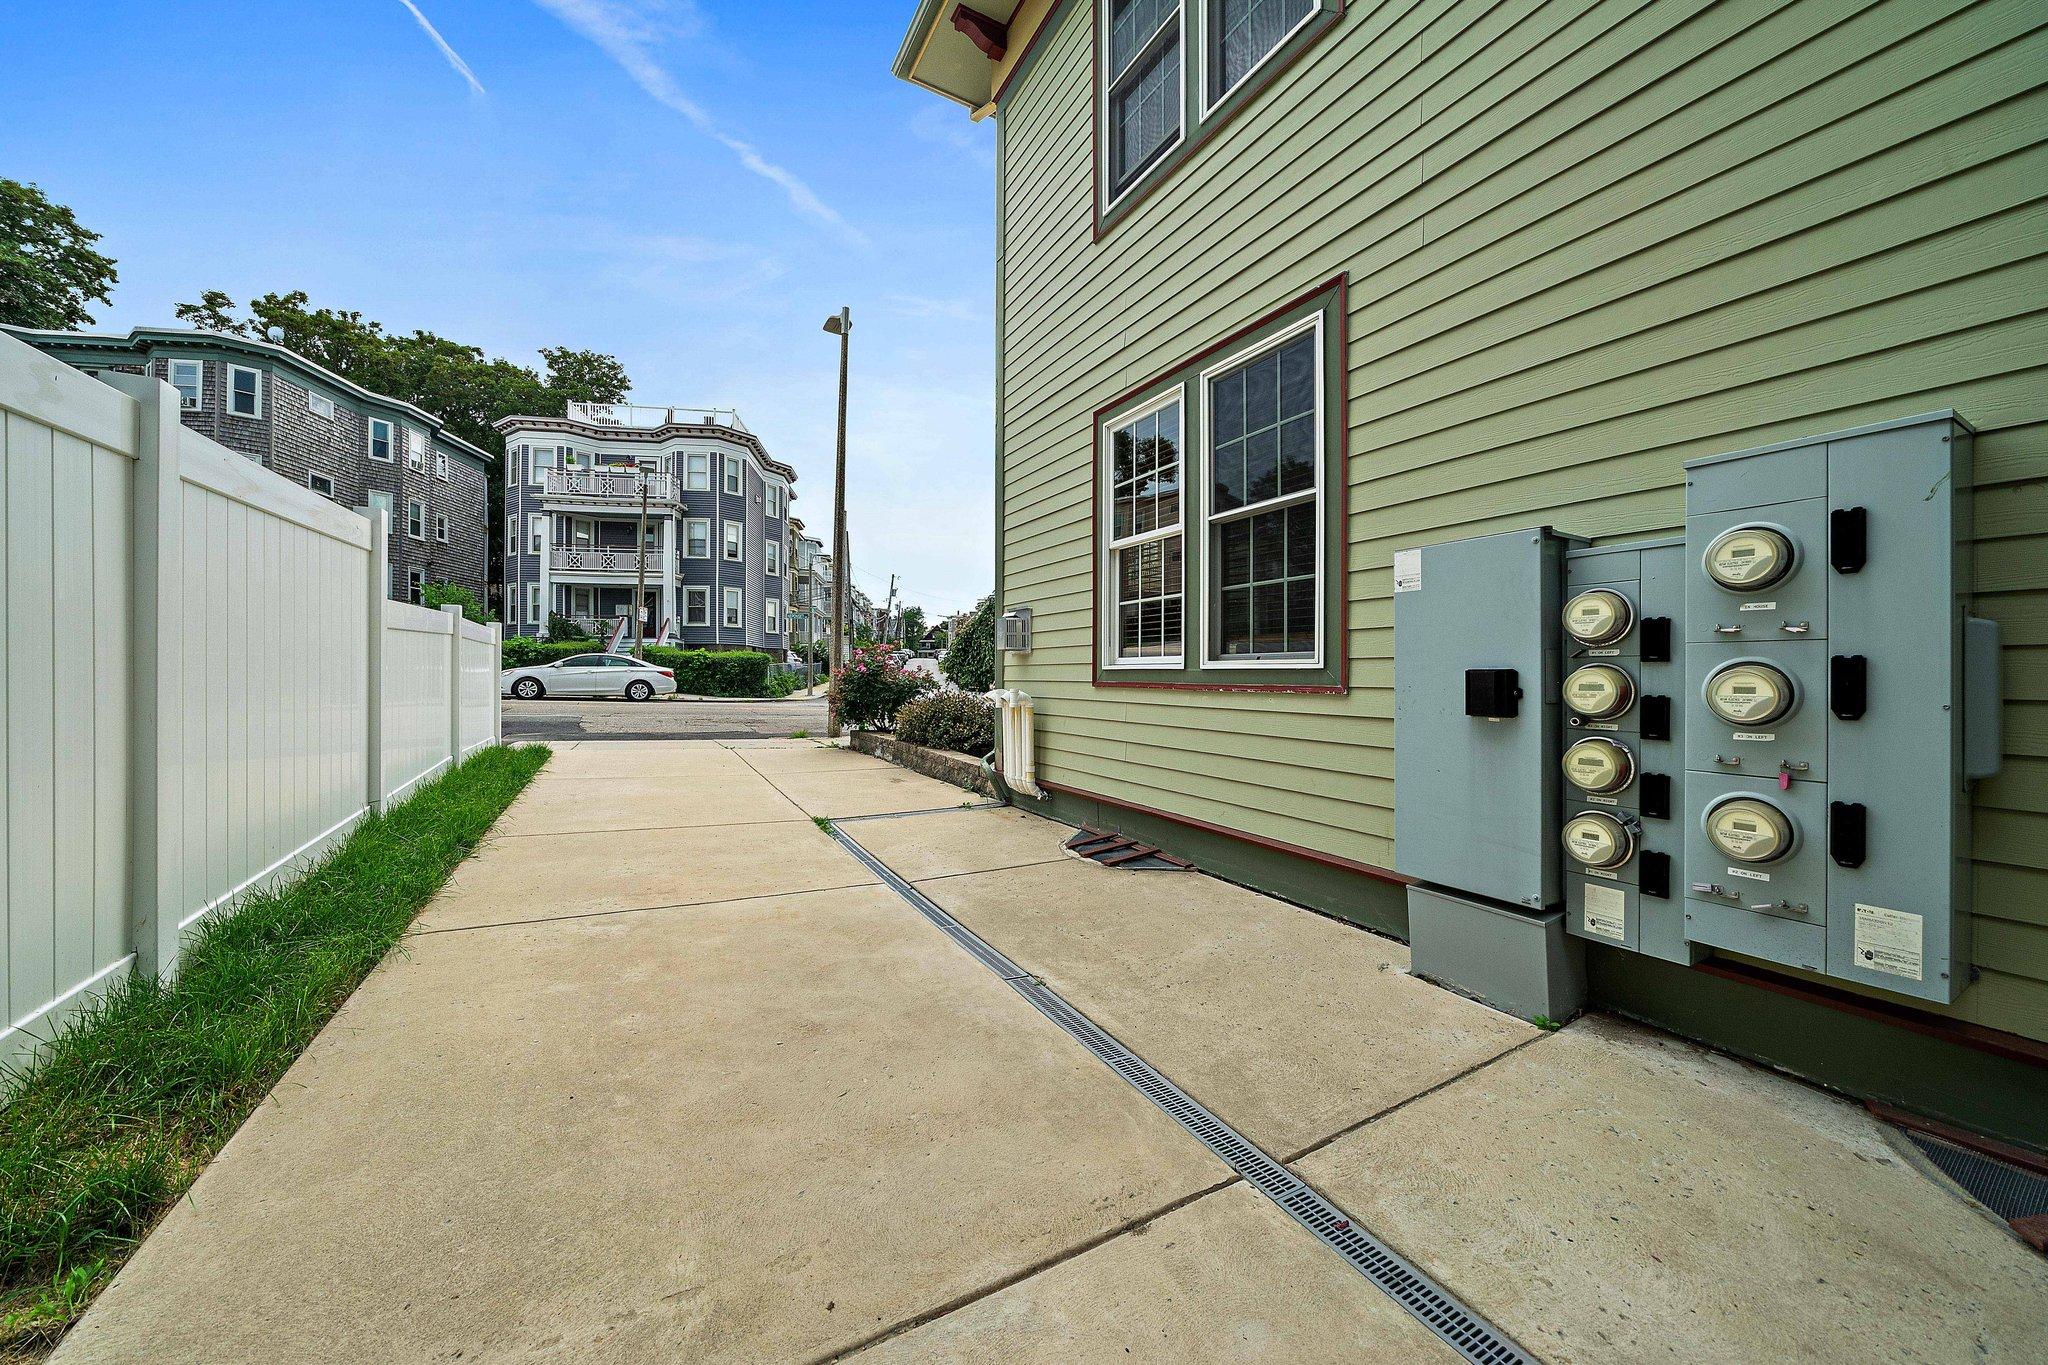 96 Neponset Ave, Dorchester, MA 02122, USA Photo 12